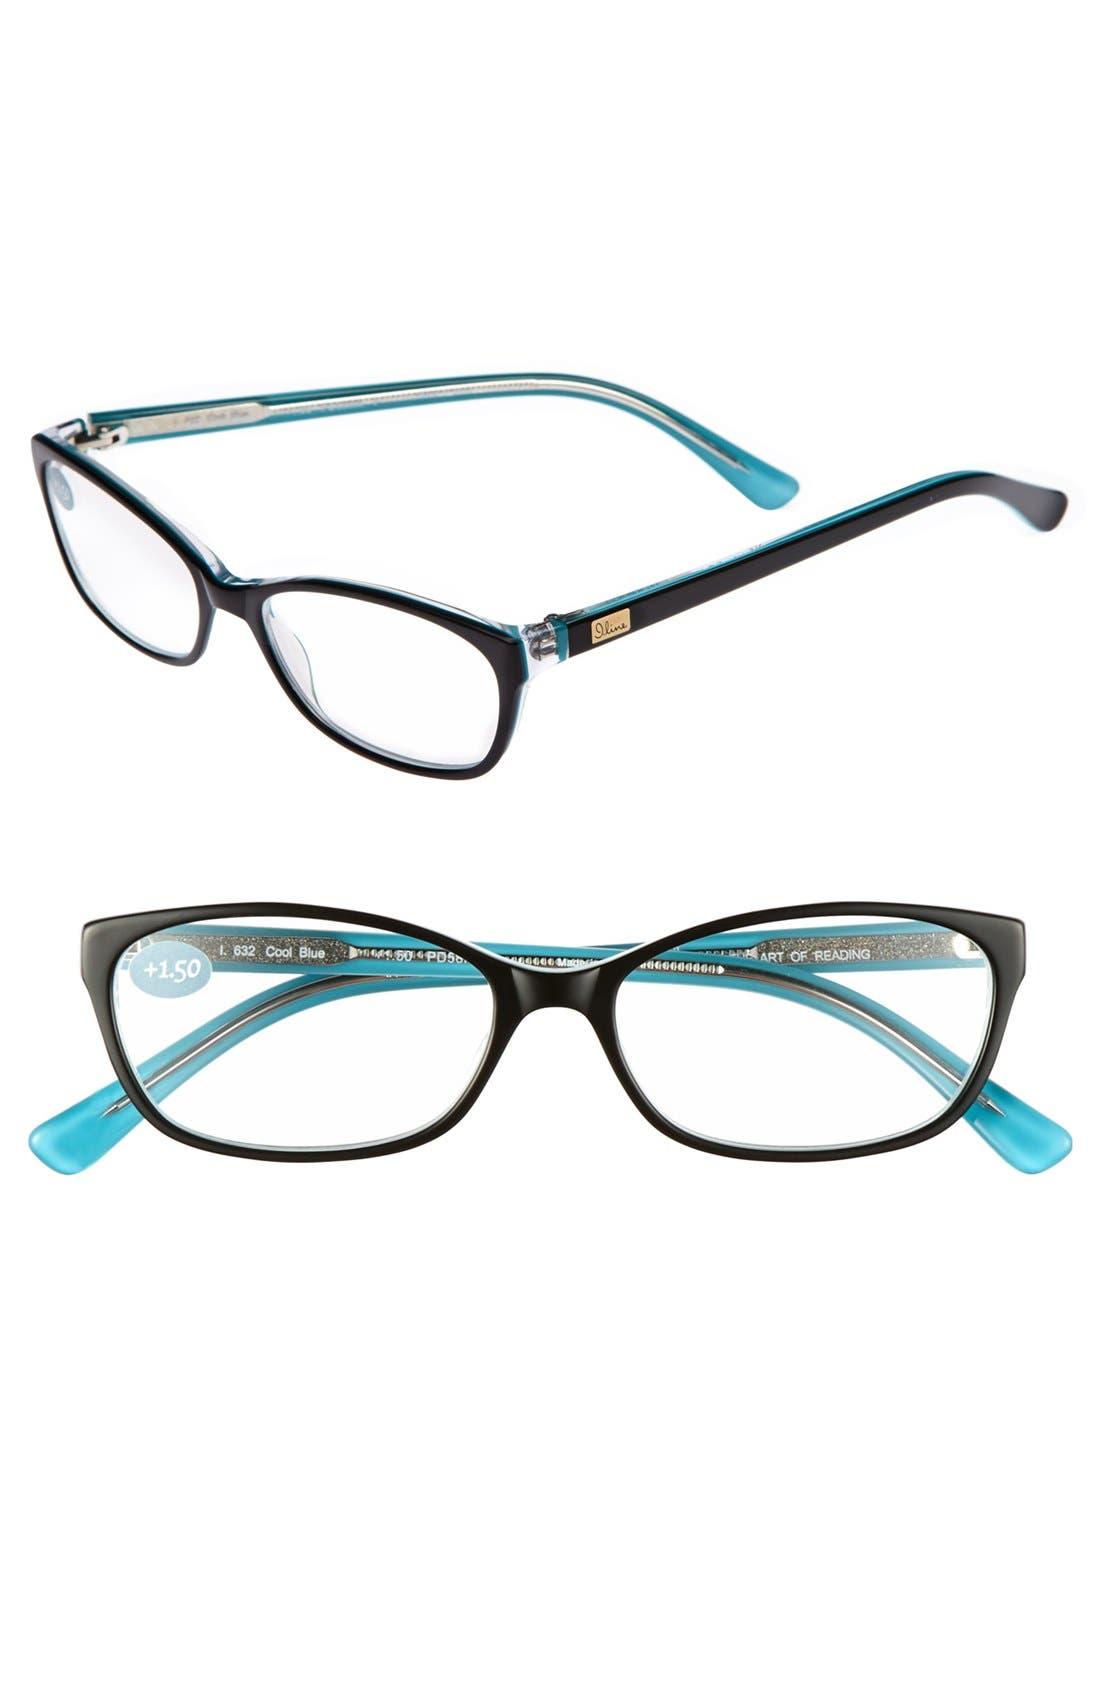 Main Image - I Line Eyewear 'Cool Blue' 53mm Reading Glasses